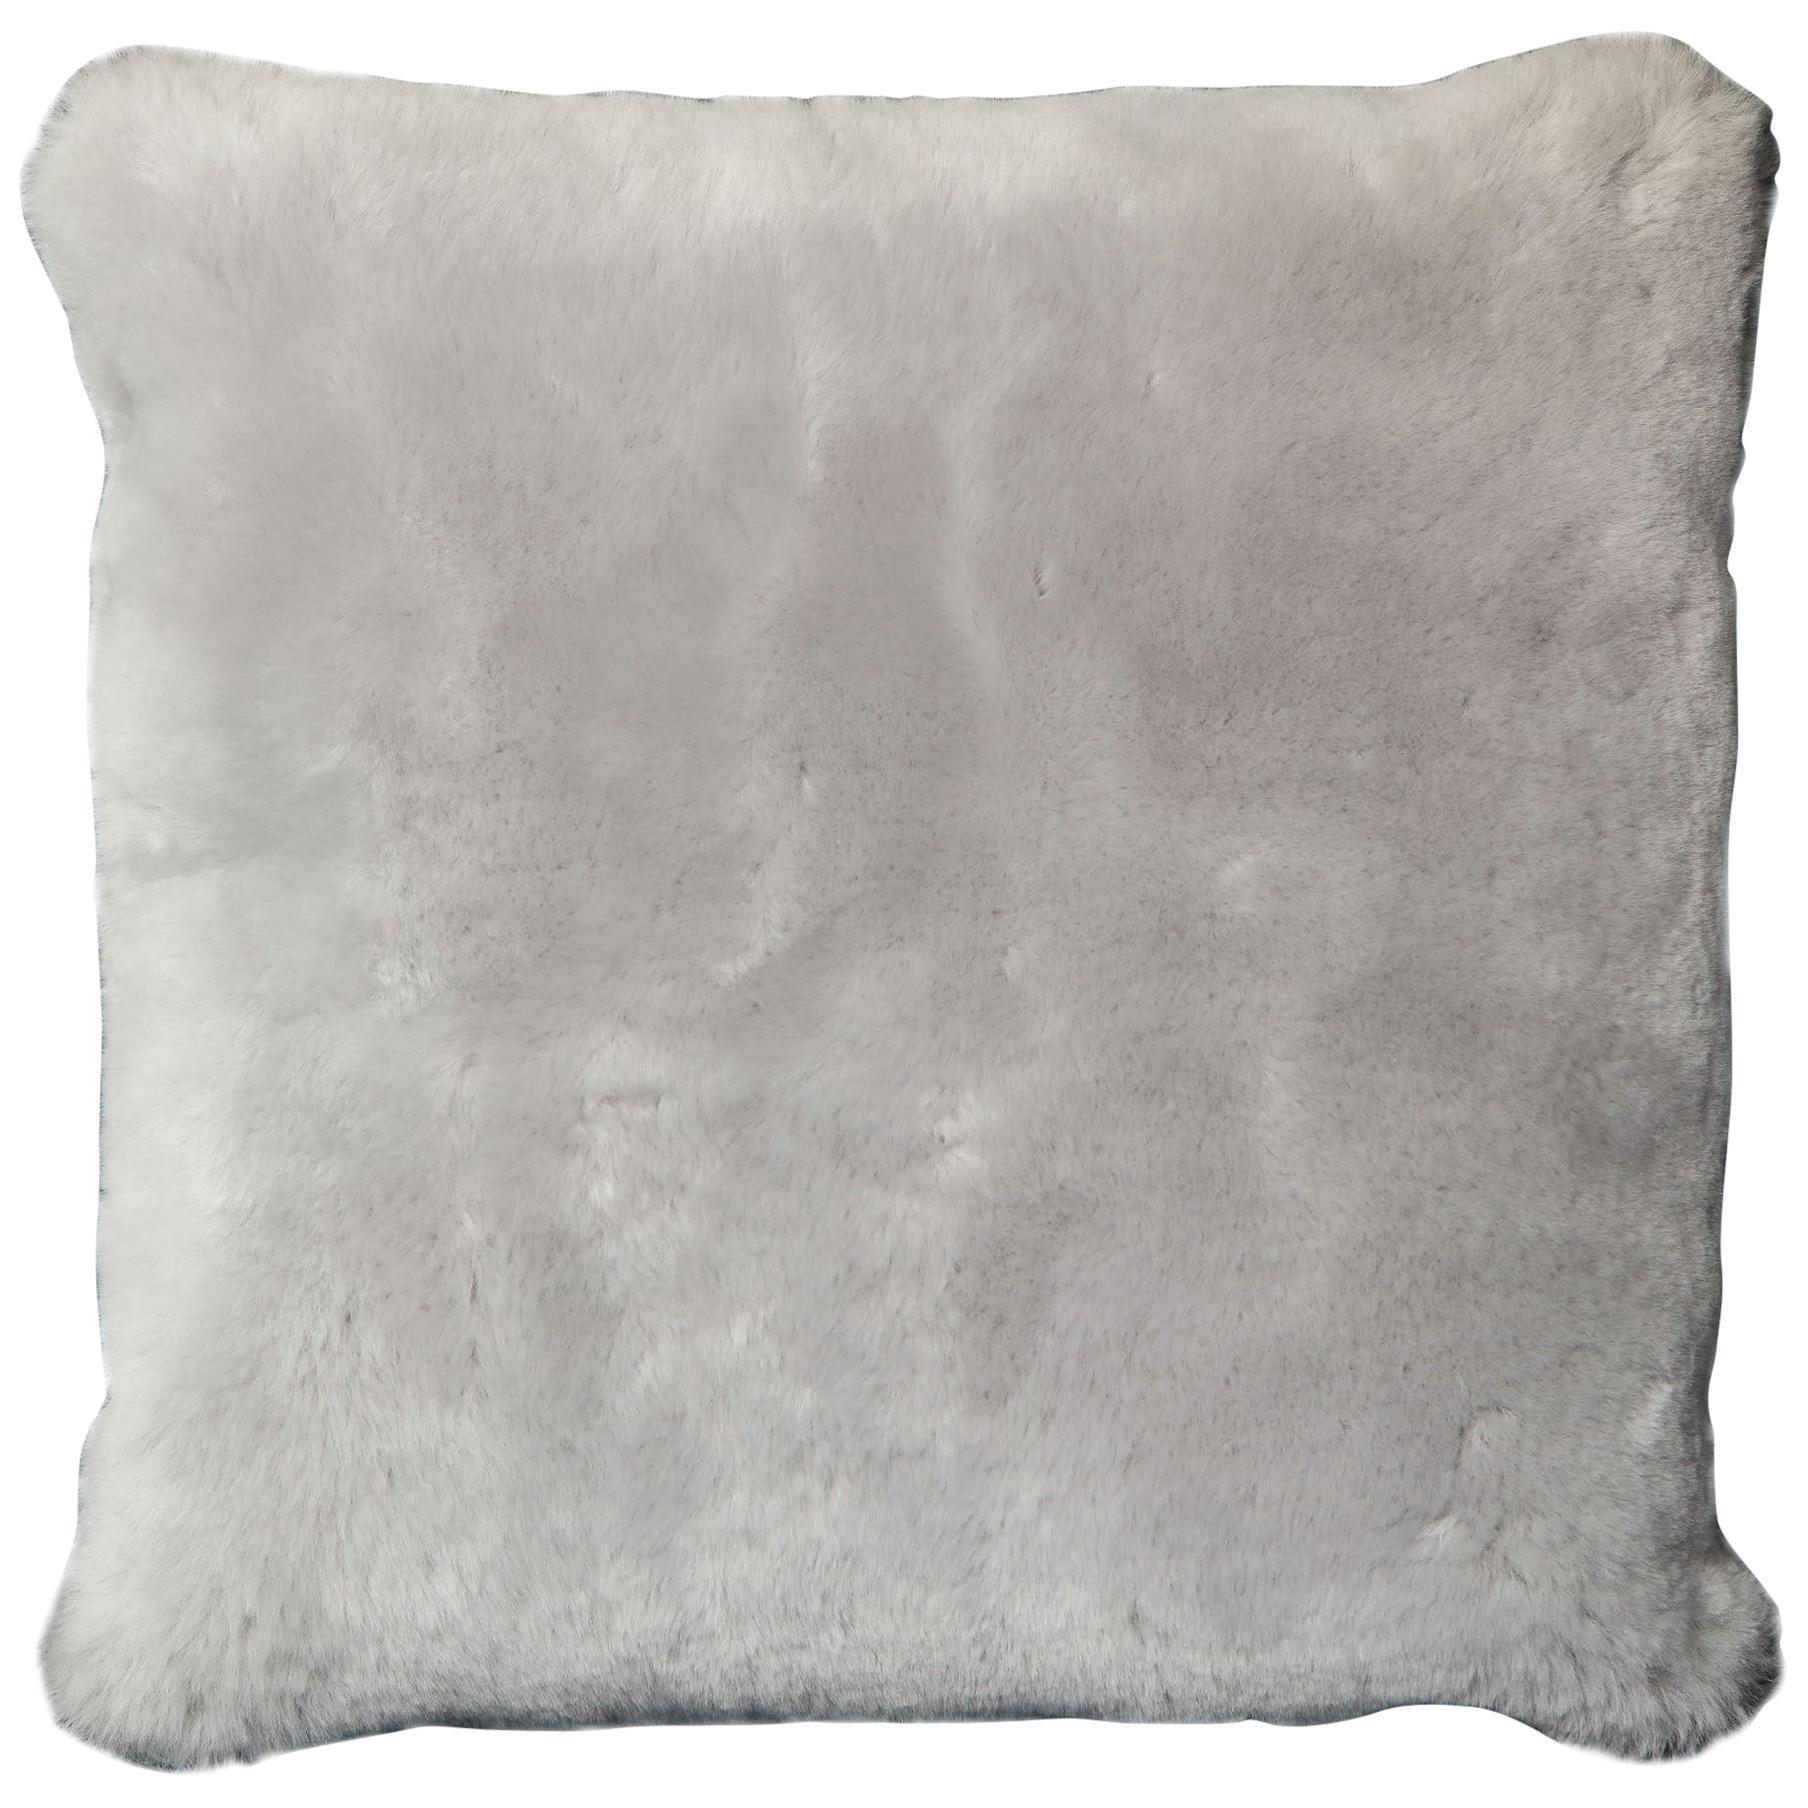 Genuine Shearling Pillow in Platinum Color